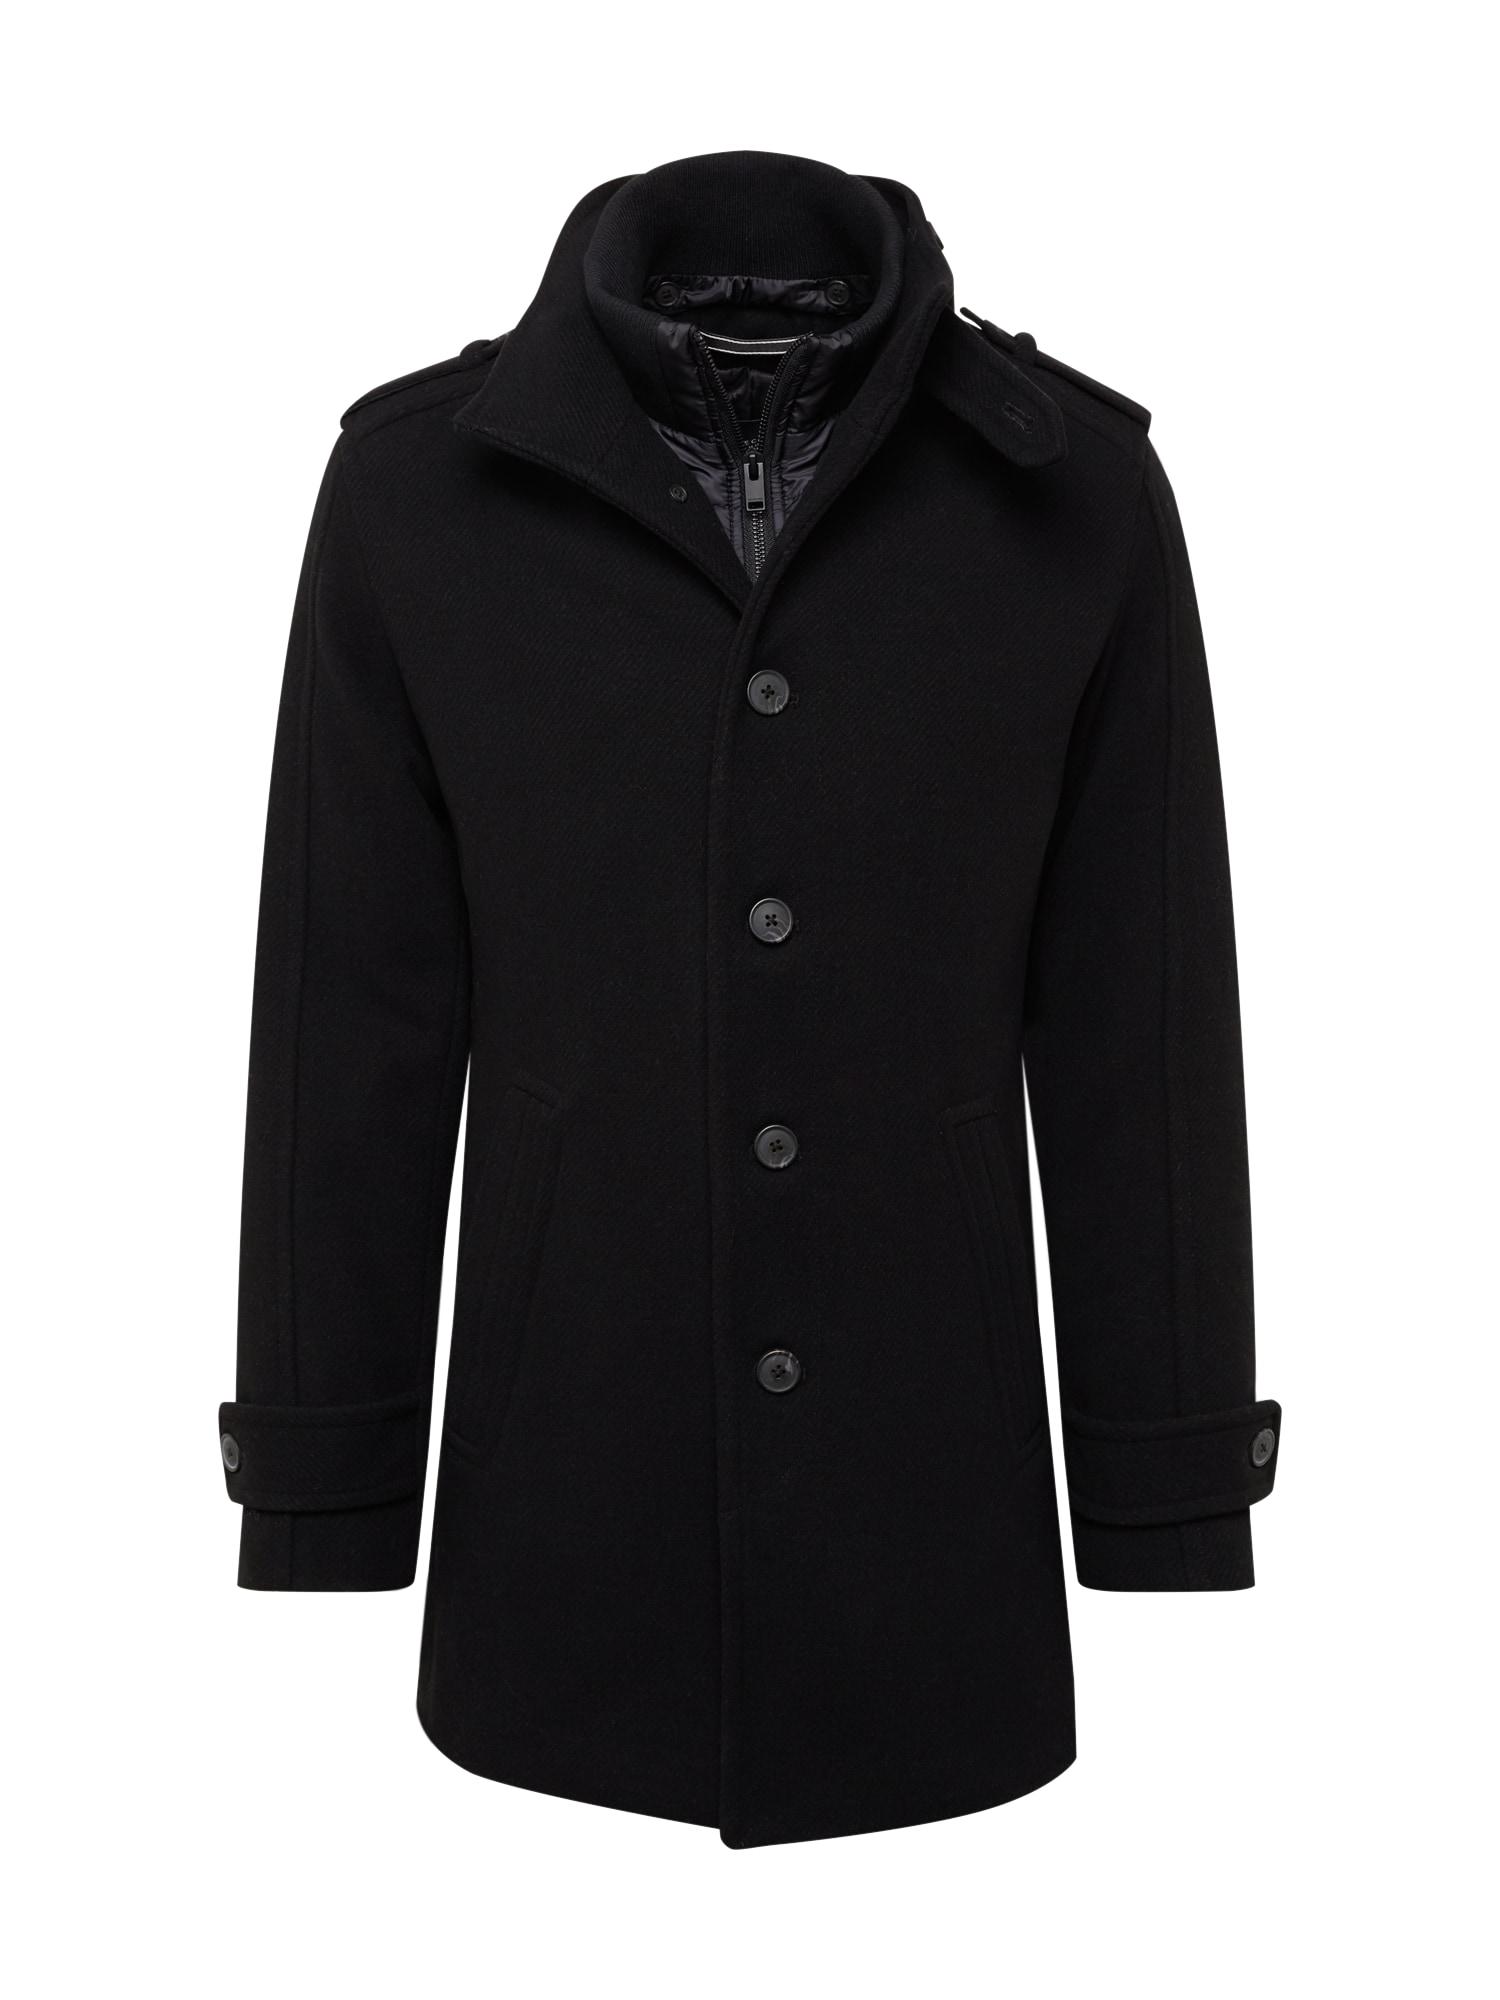 SELECTED HOMME Rudeninis-žieminis paltas 'NOAH' juoda